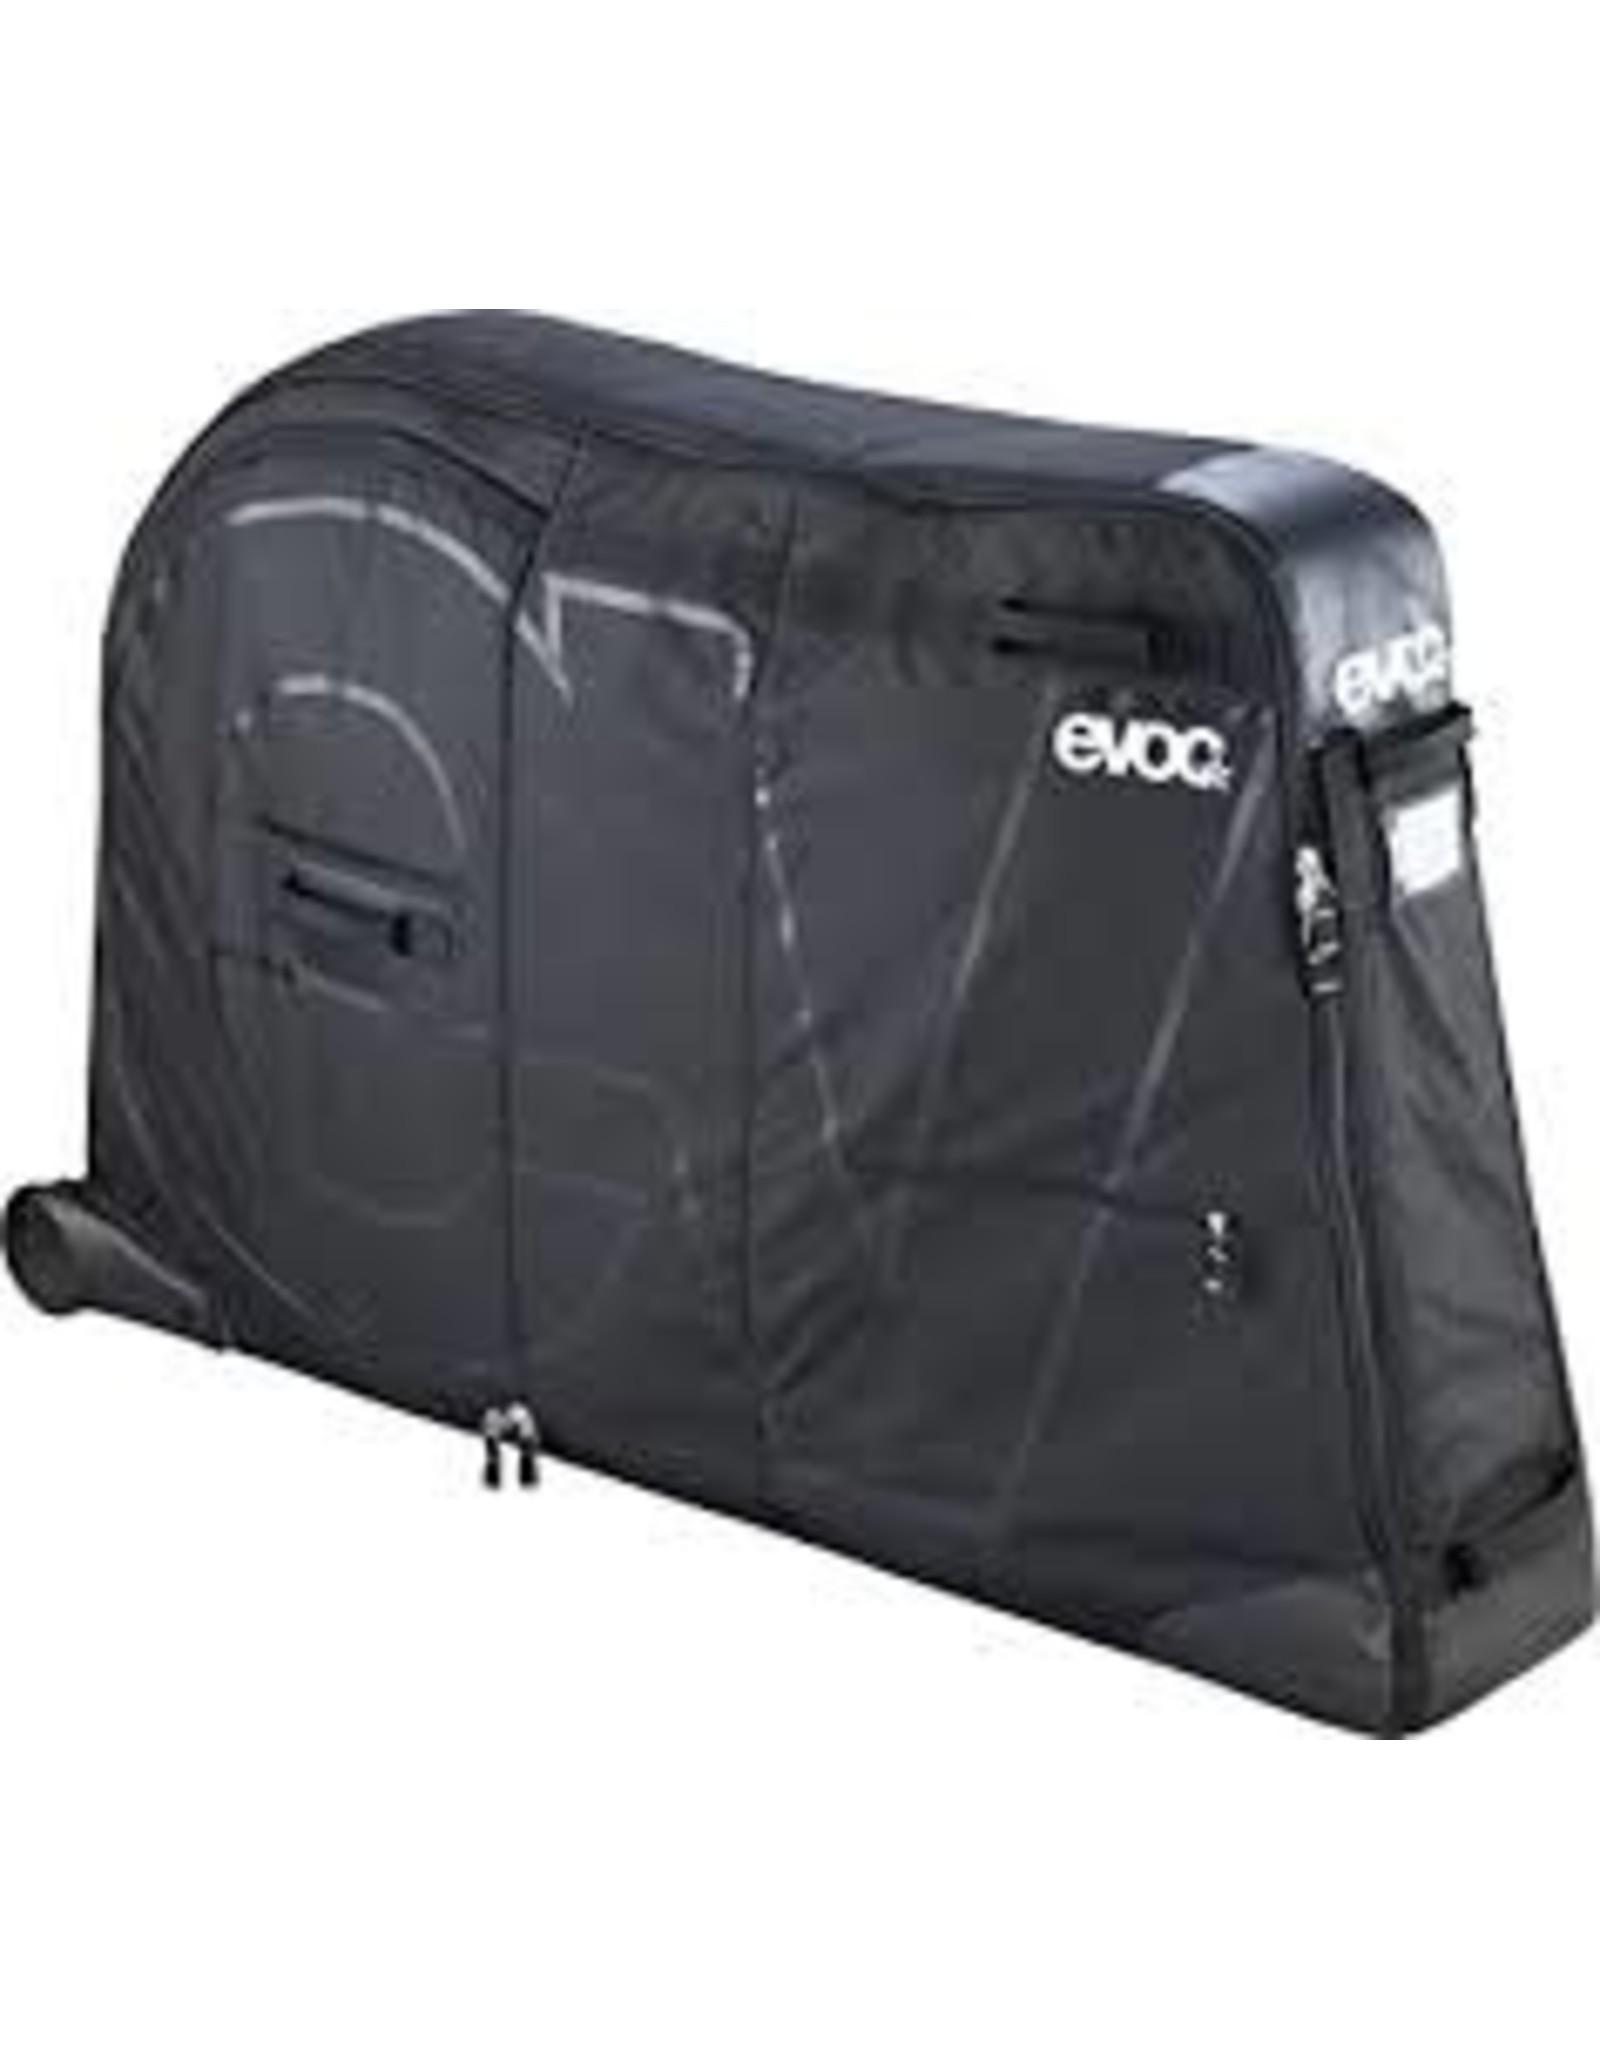 EVOC EVOC - Bike Travel Bag Black 285L